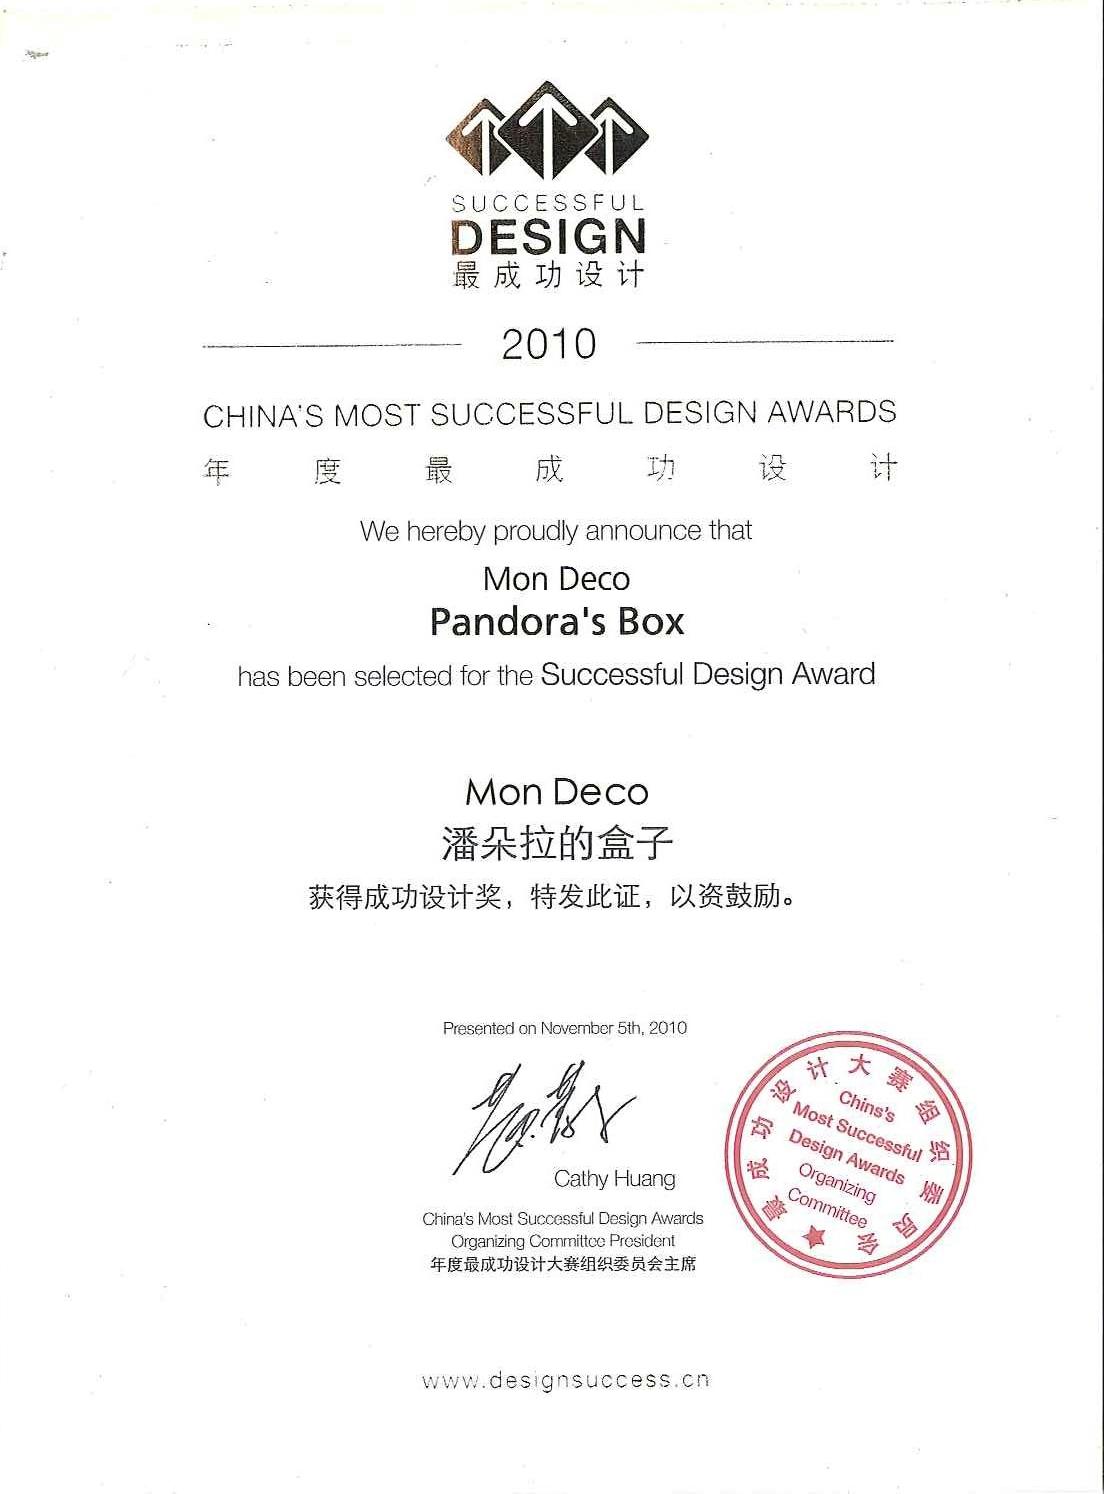 2010 sucessful design award